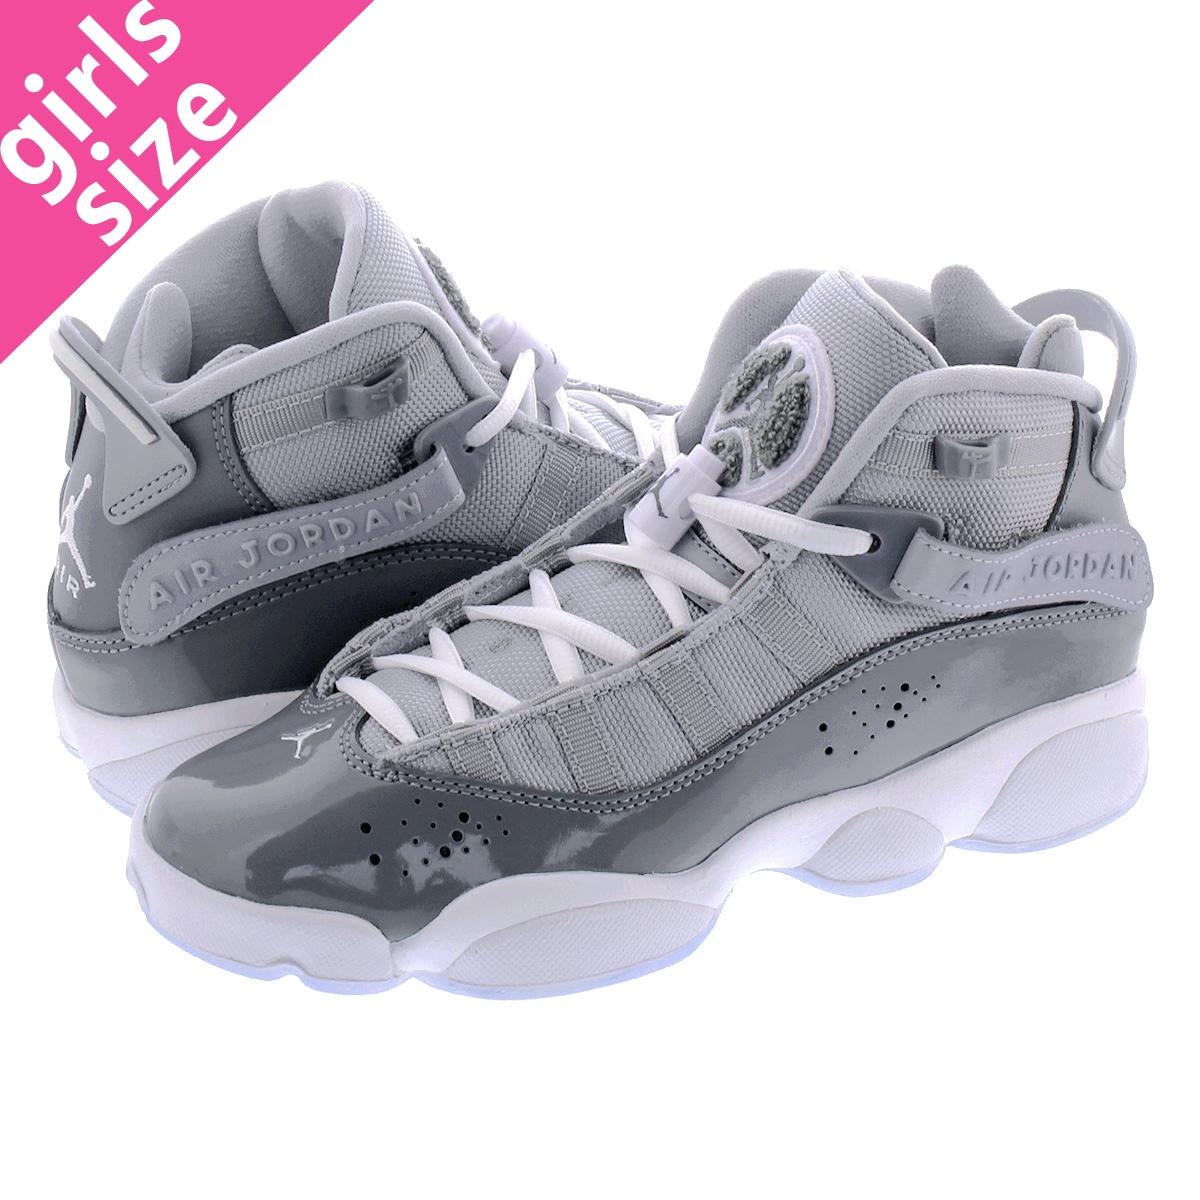 meet 50f5c f9472 NIKE JORDAN 6 RINGS BG Nike Air Jordan 6 RINGS Co.,Ltd. BG COOL  GREY/WHITE/WOLF GREY 323,419-015